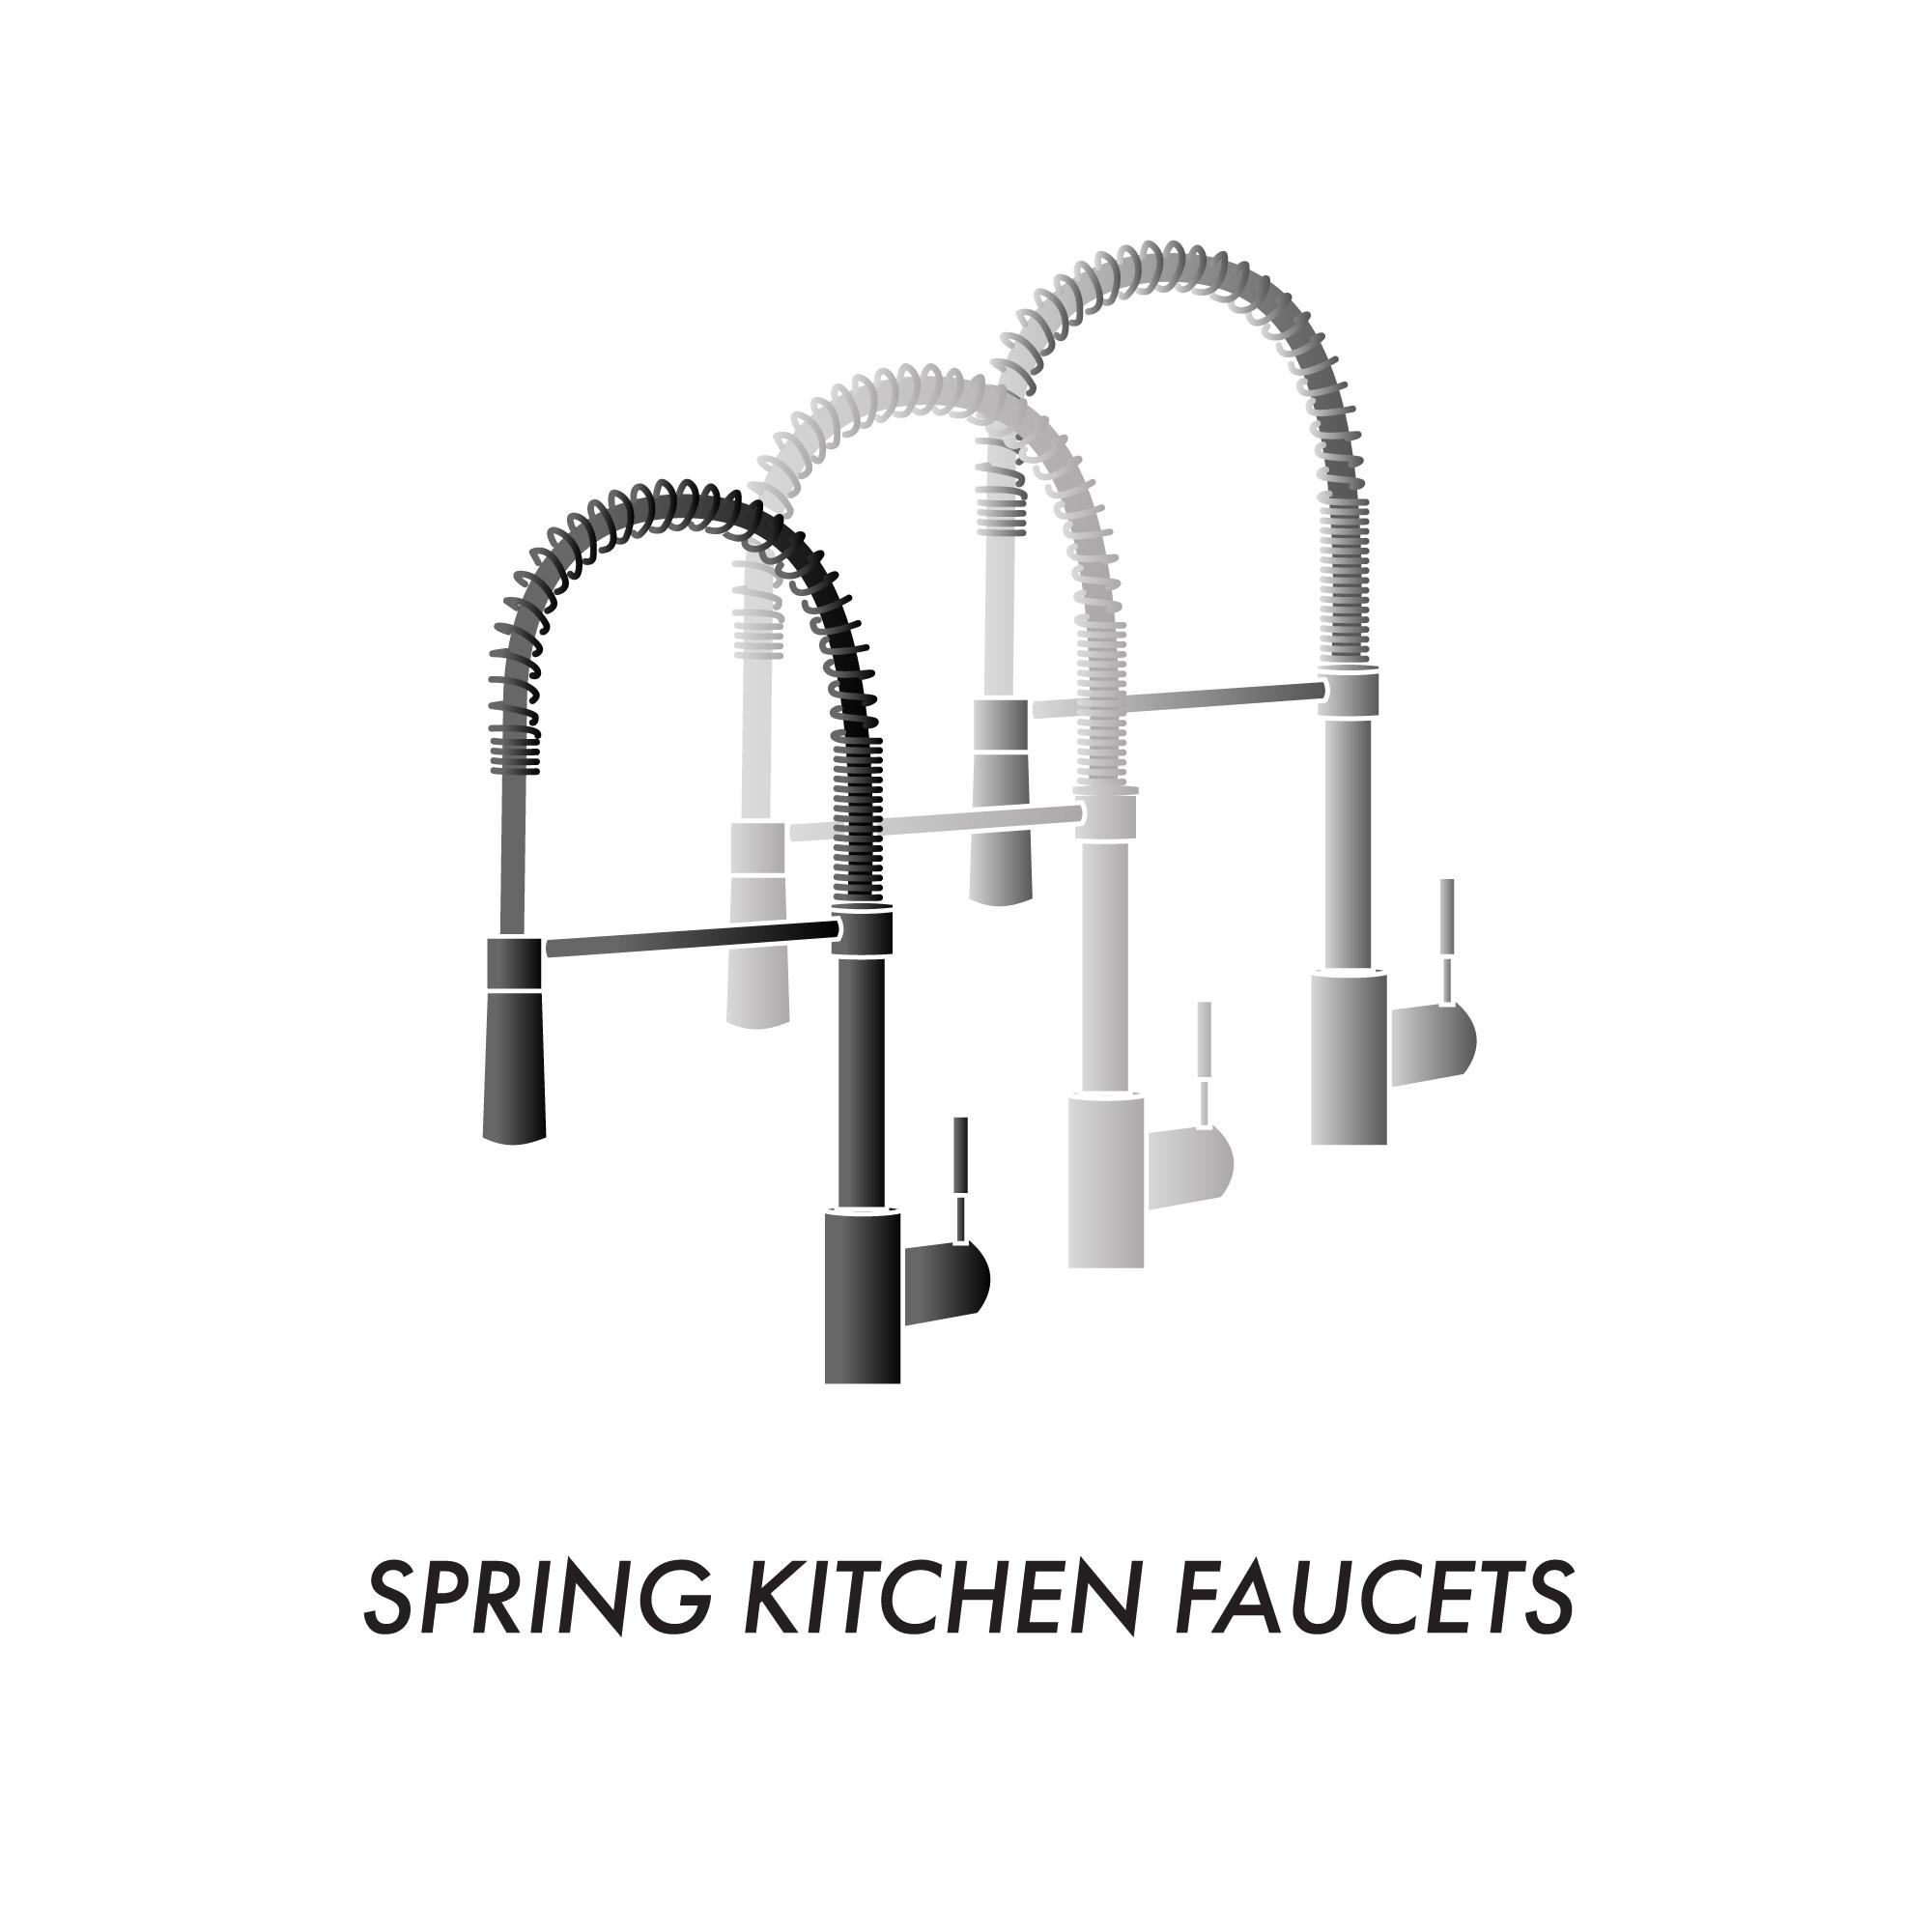 spring-kitchen-faucet.jpg